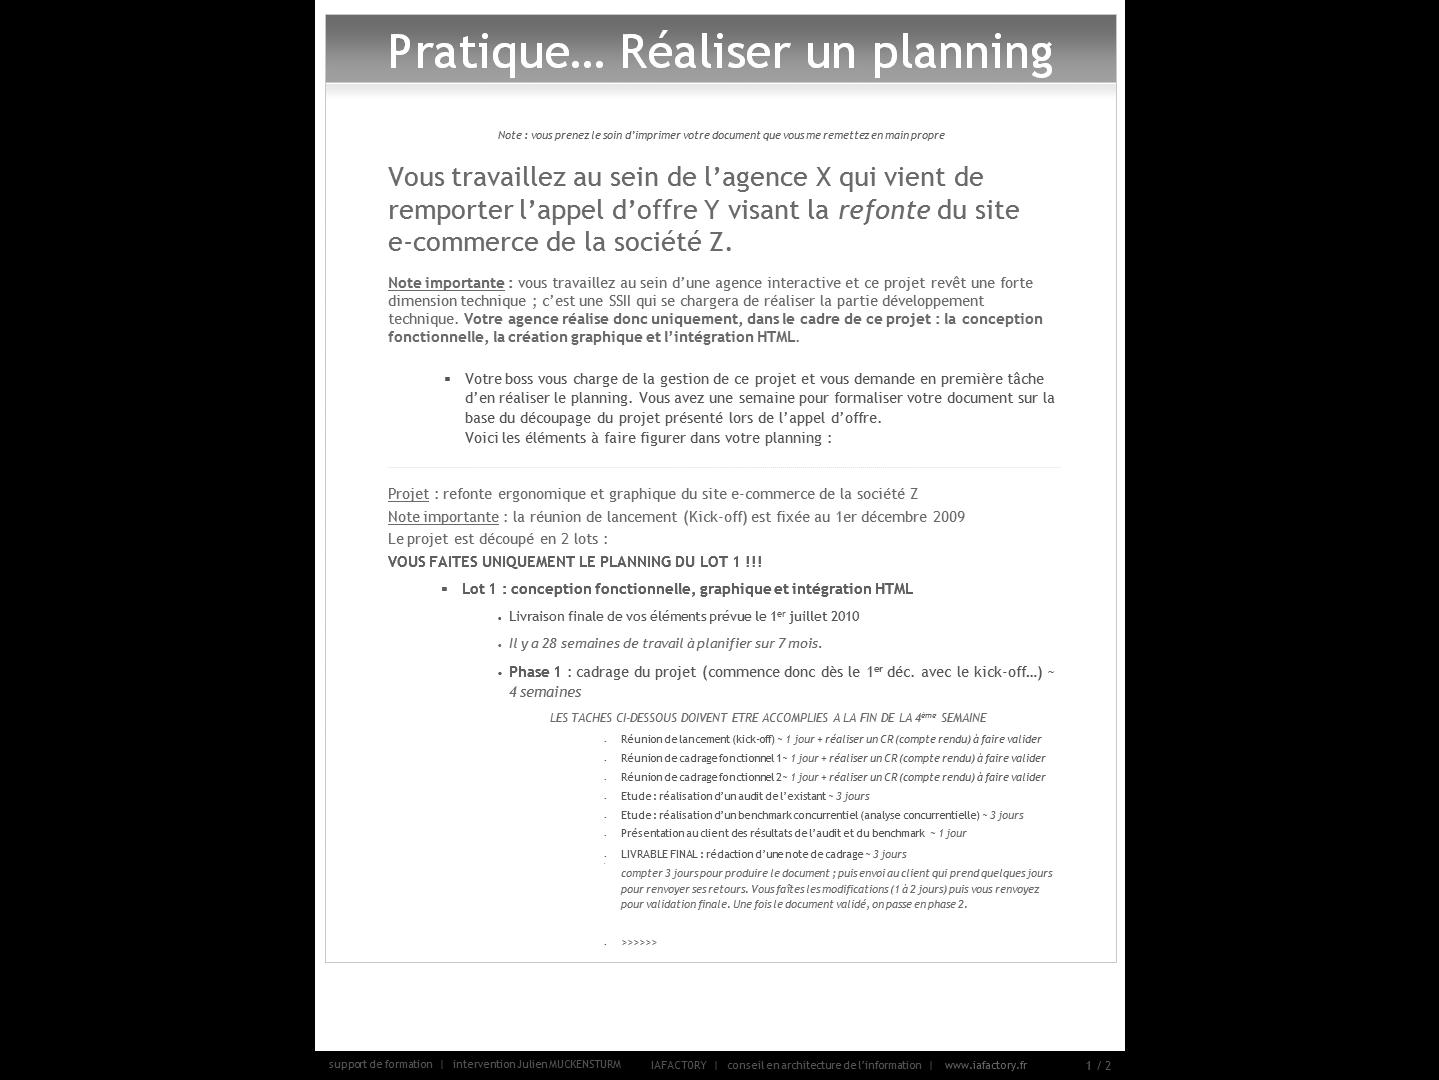 formation universitaire en gestion de projet – outils (exercice planning)